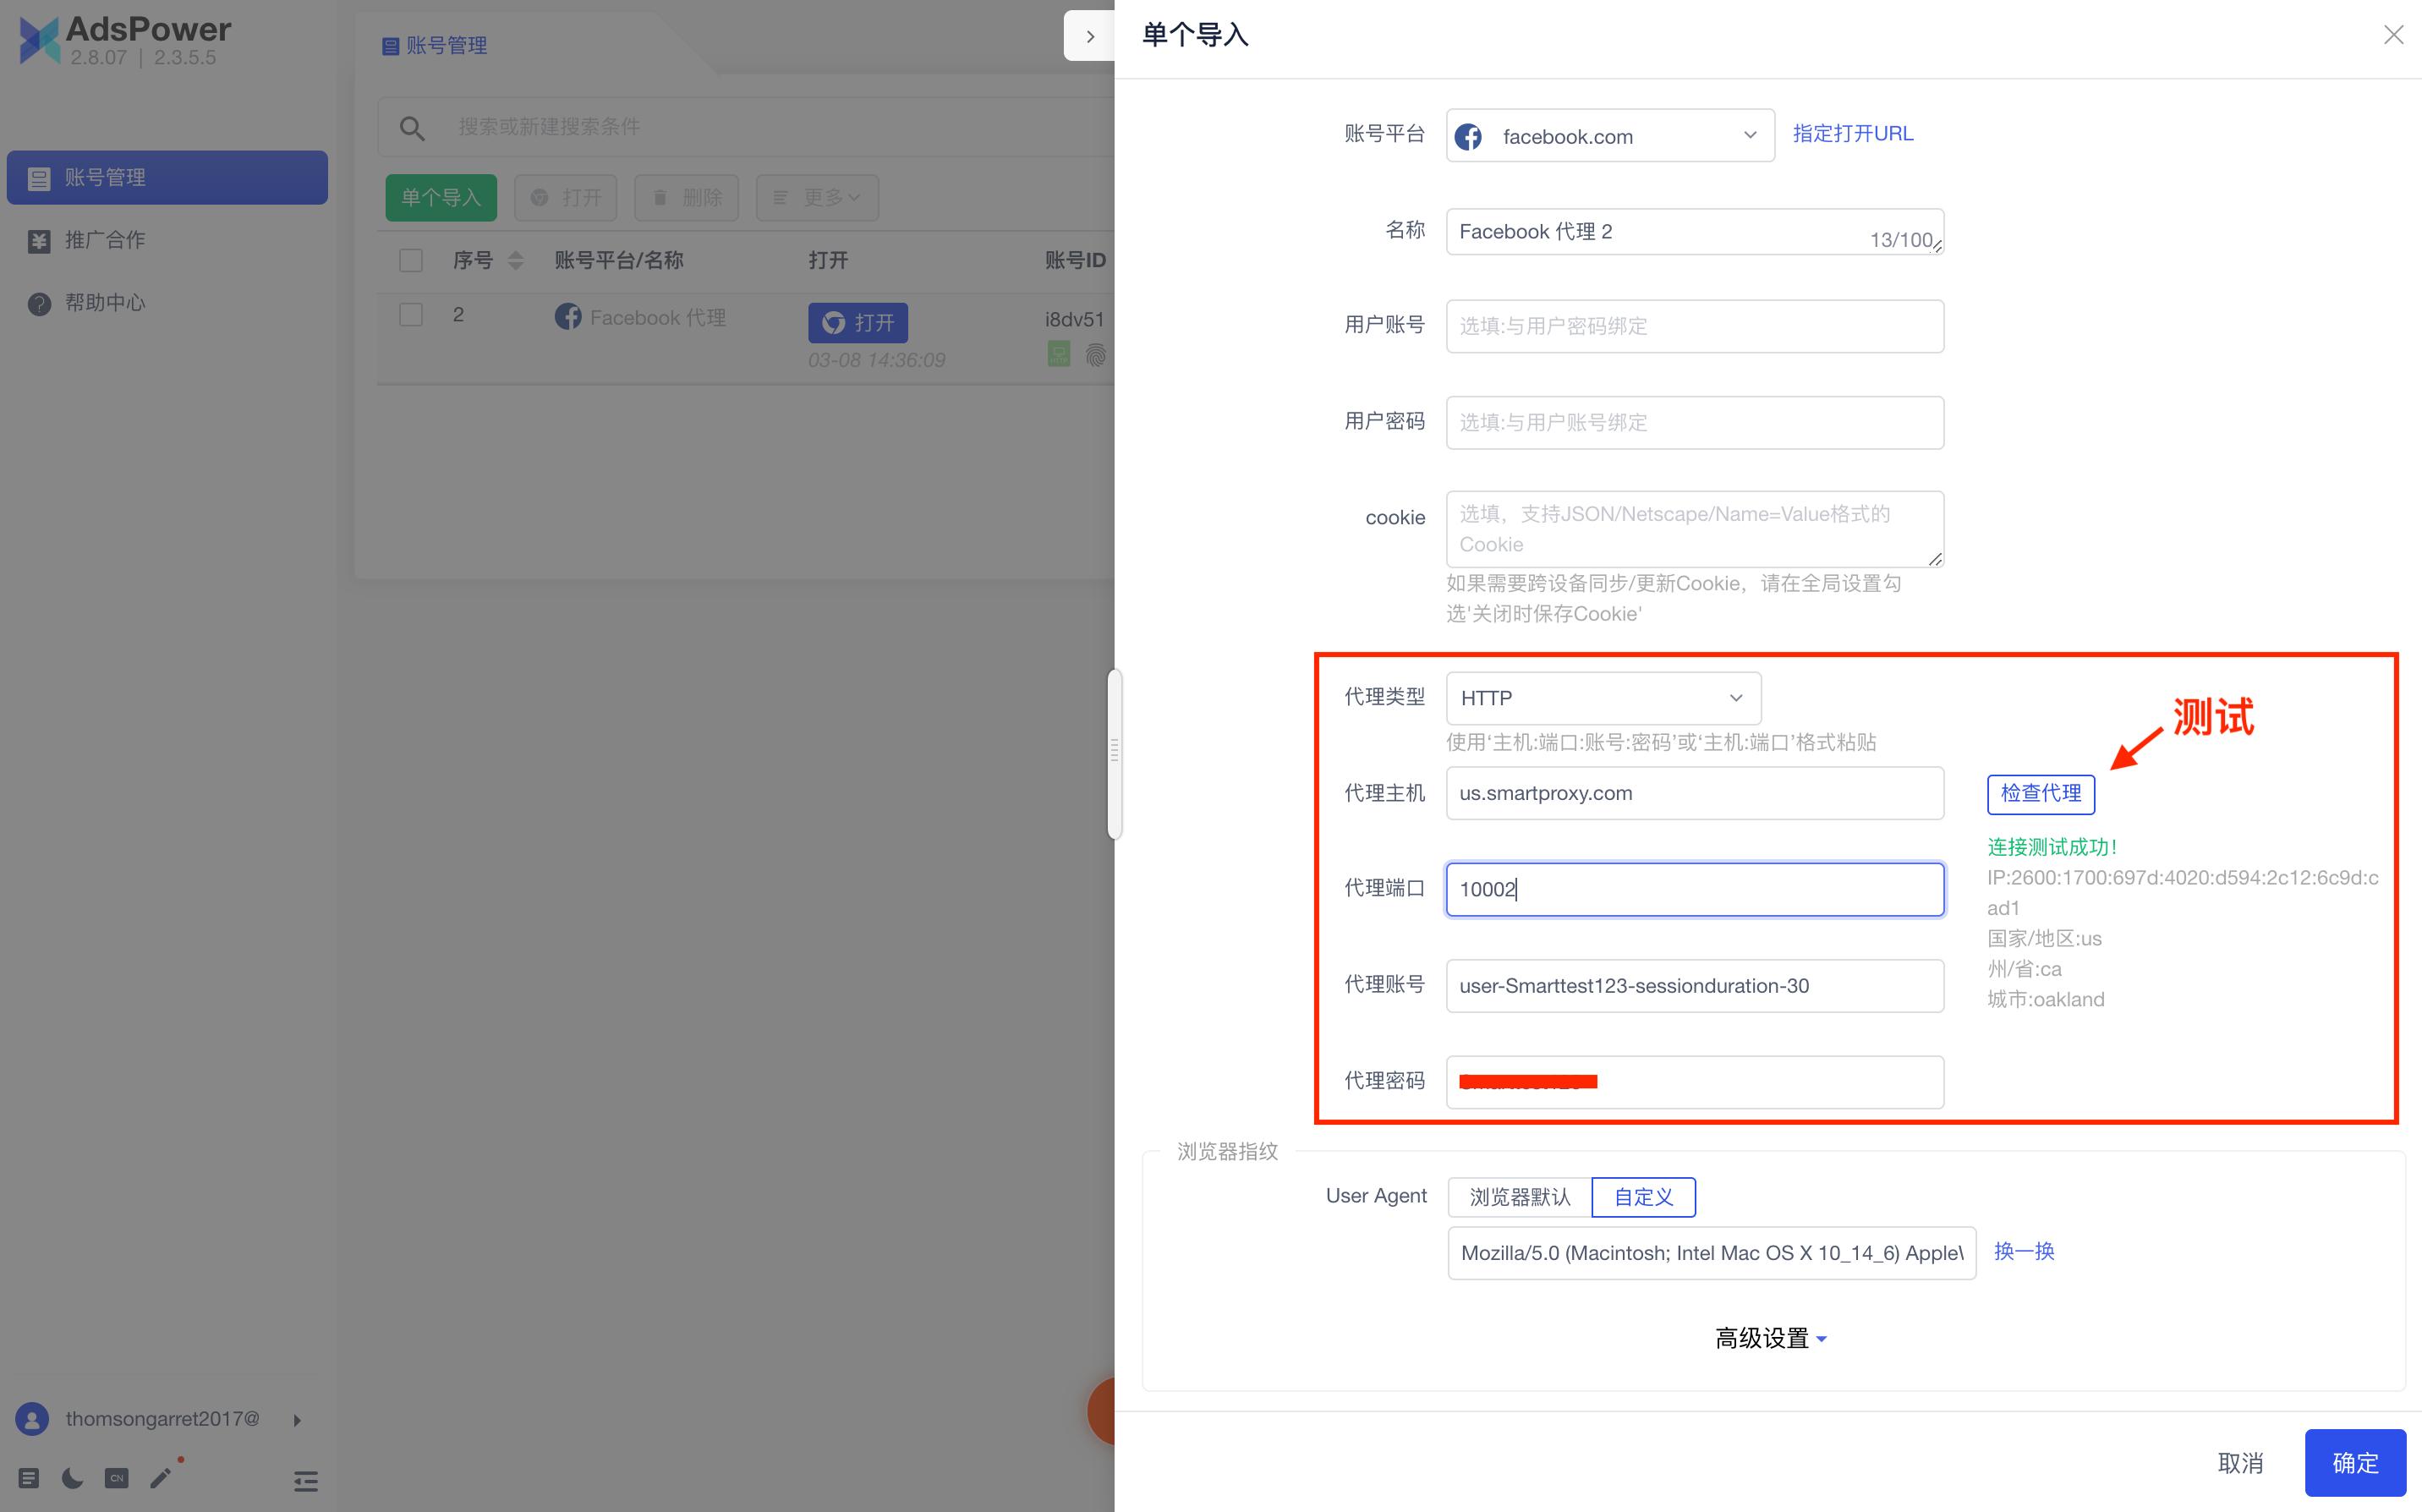 AdsPower - 创建账户,指纹并且匹配Smartproxy代理。